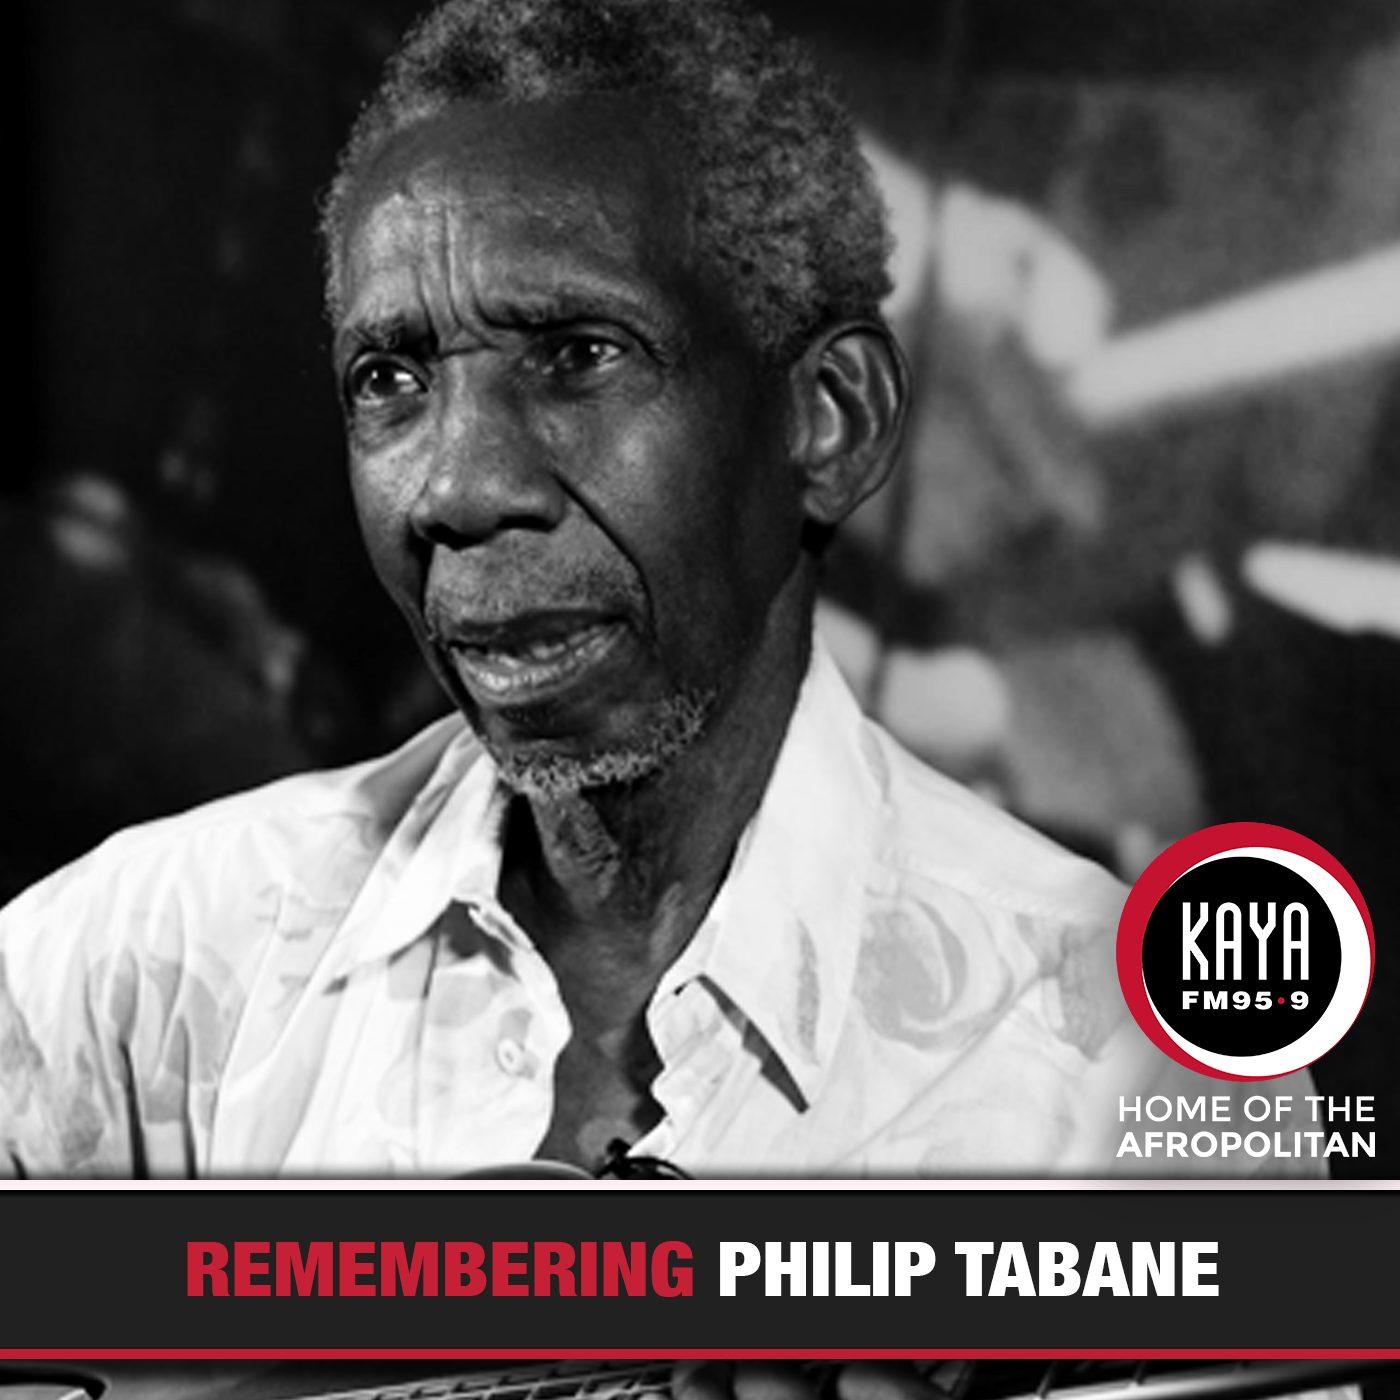 kaya fm legend tributes, kaya fm philip tabane tribute,